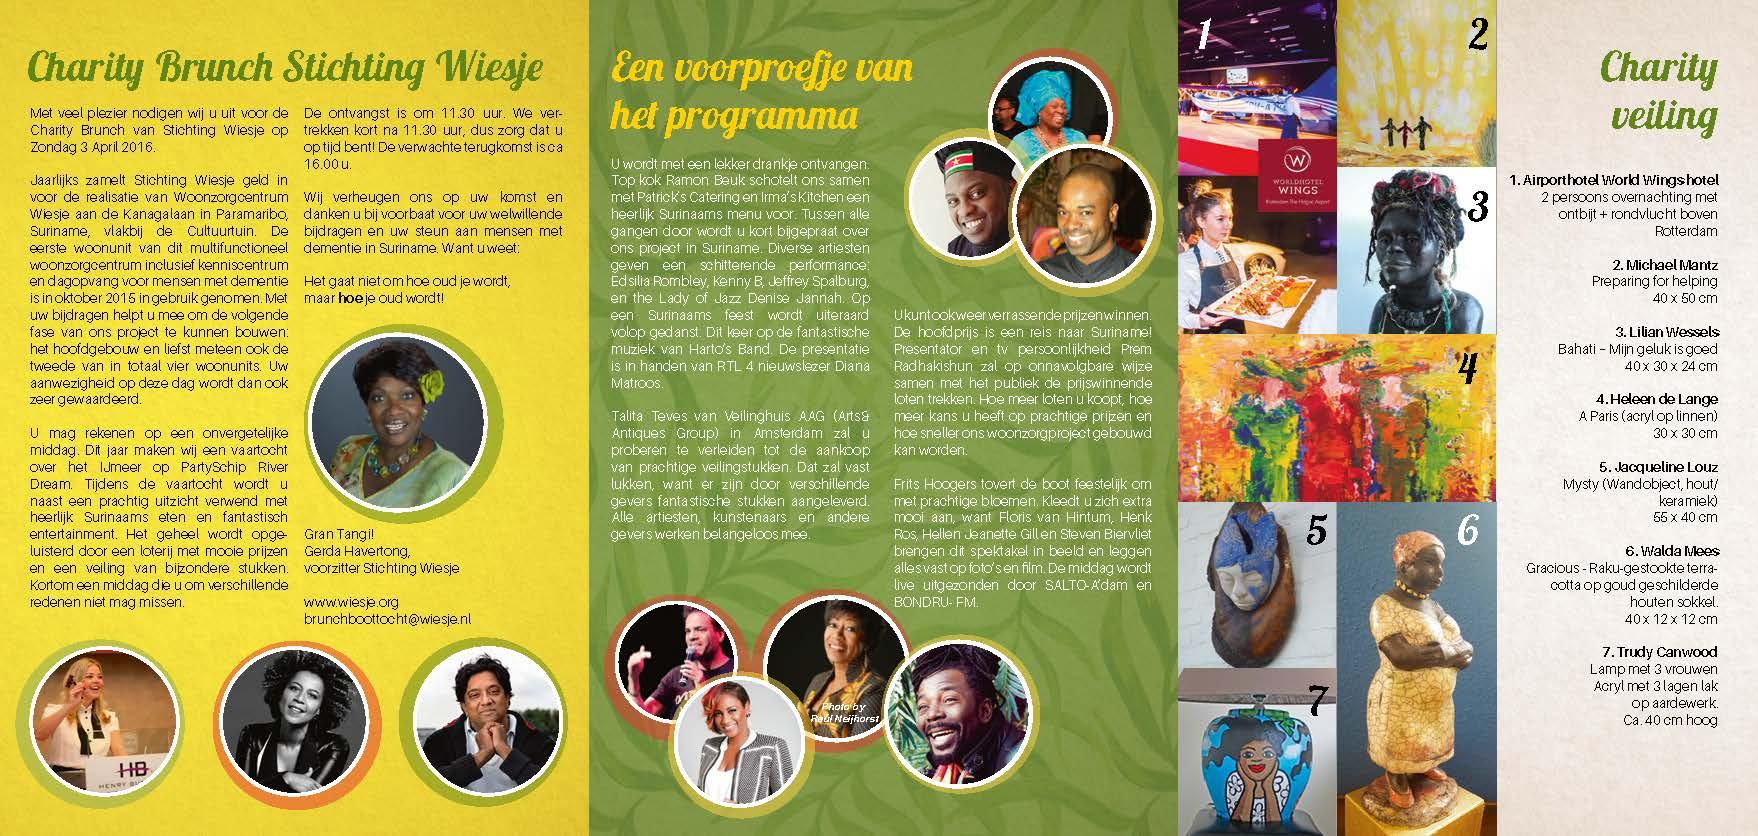 Wiesje charity uitnodiging V2 16-3-2016 (1)_Pagina_2